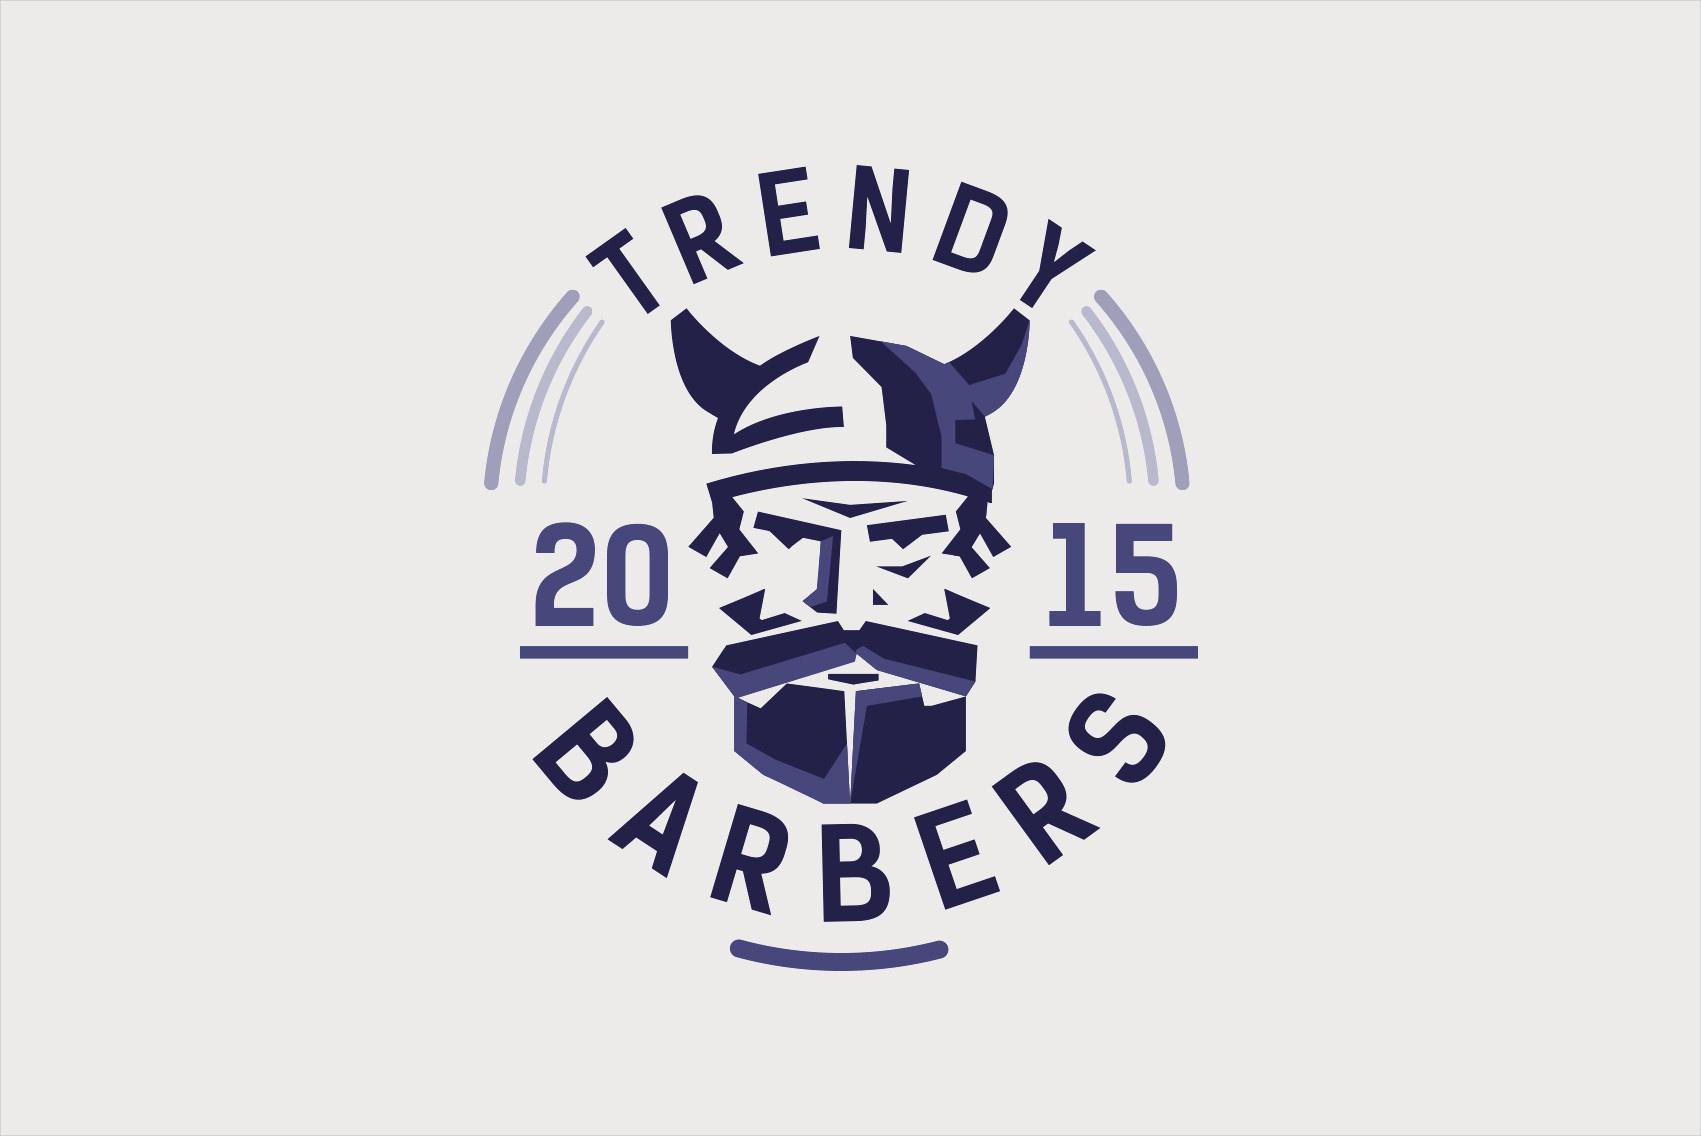 barber logo design - photo #14